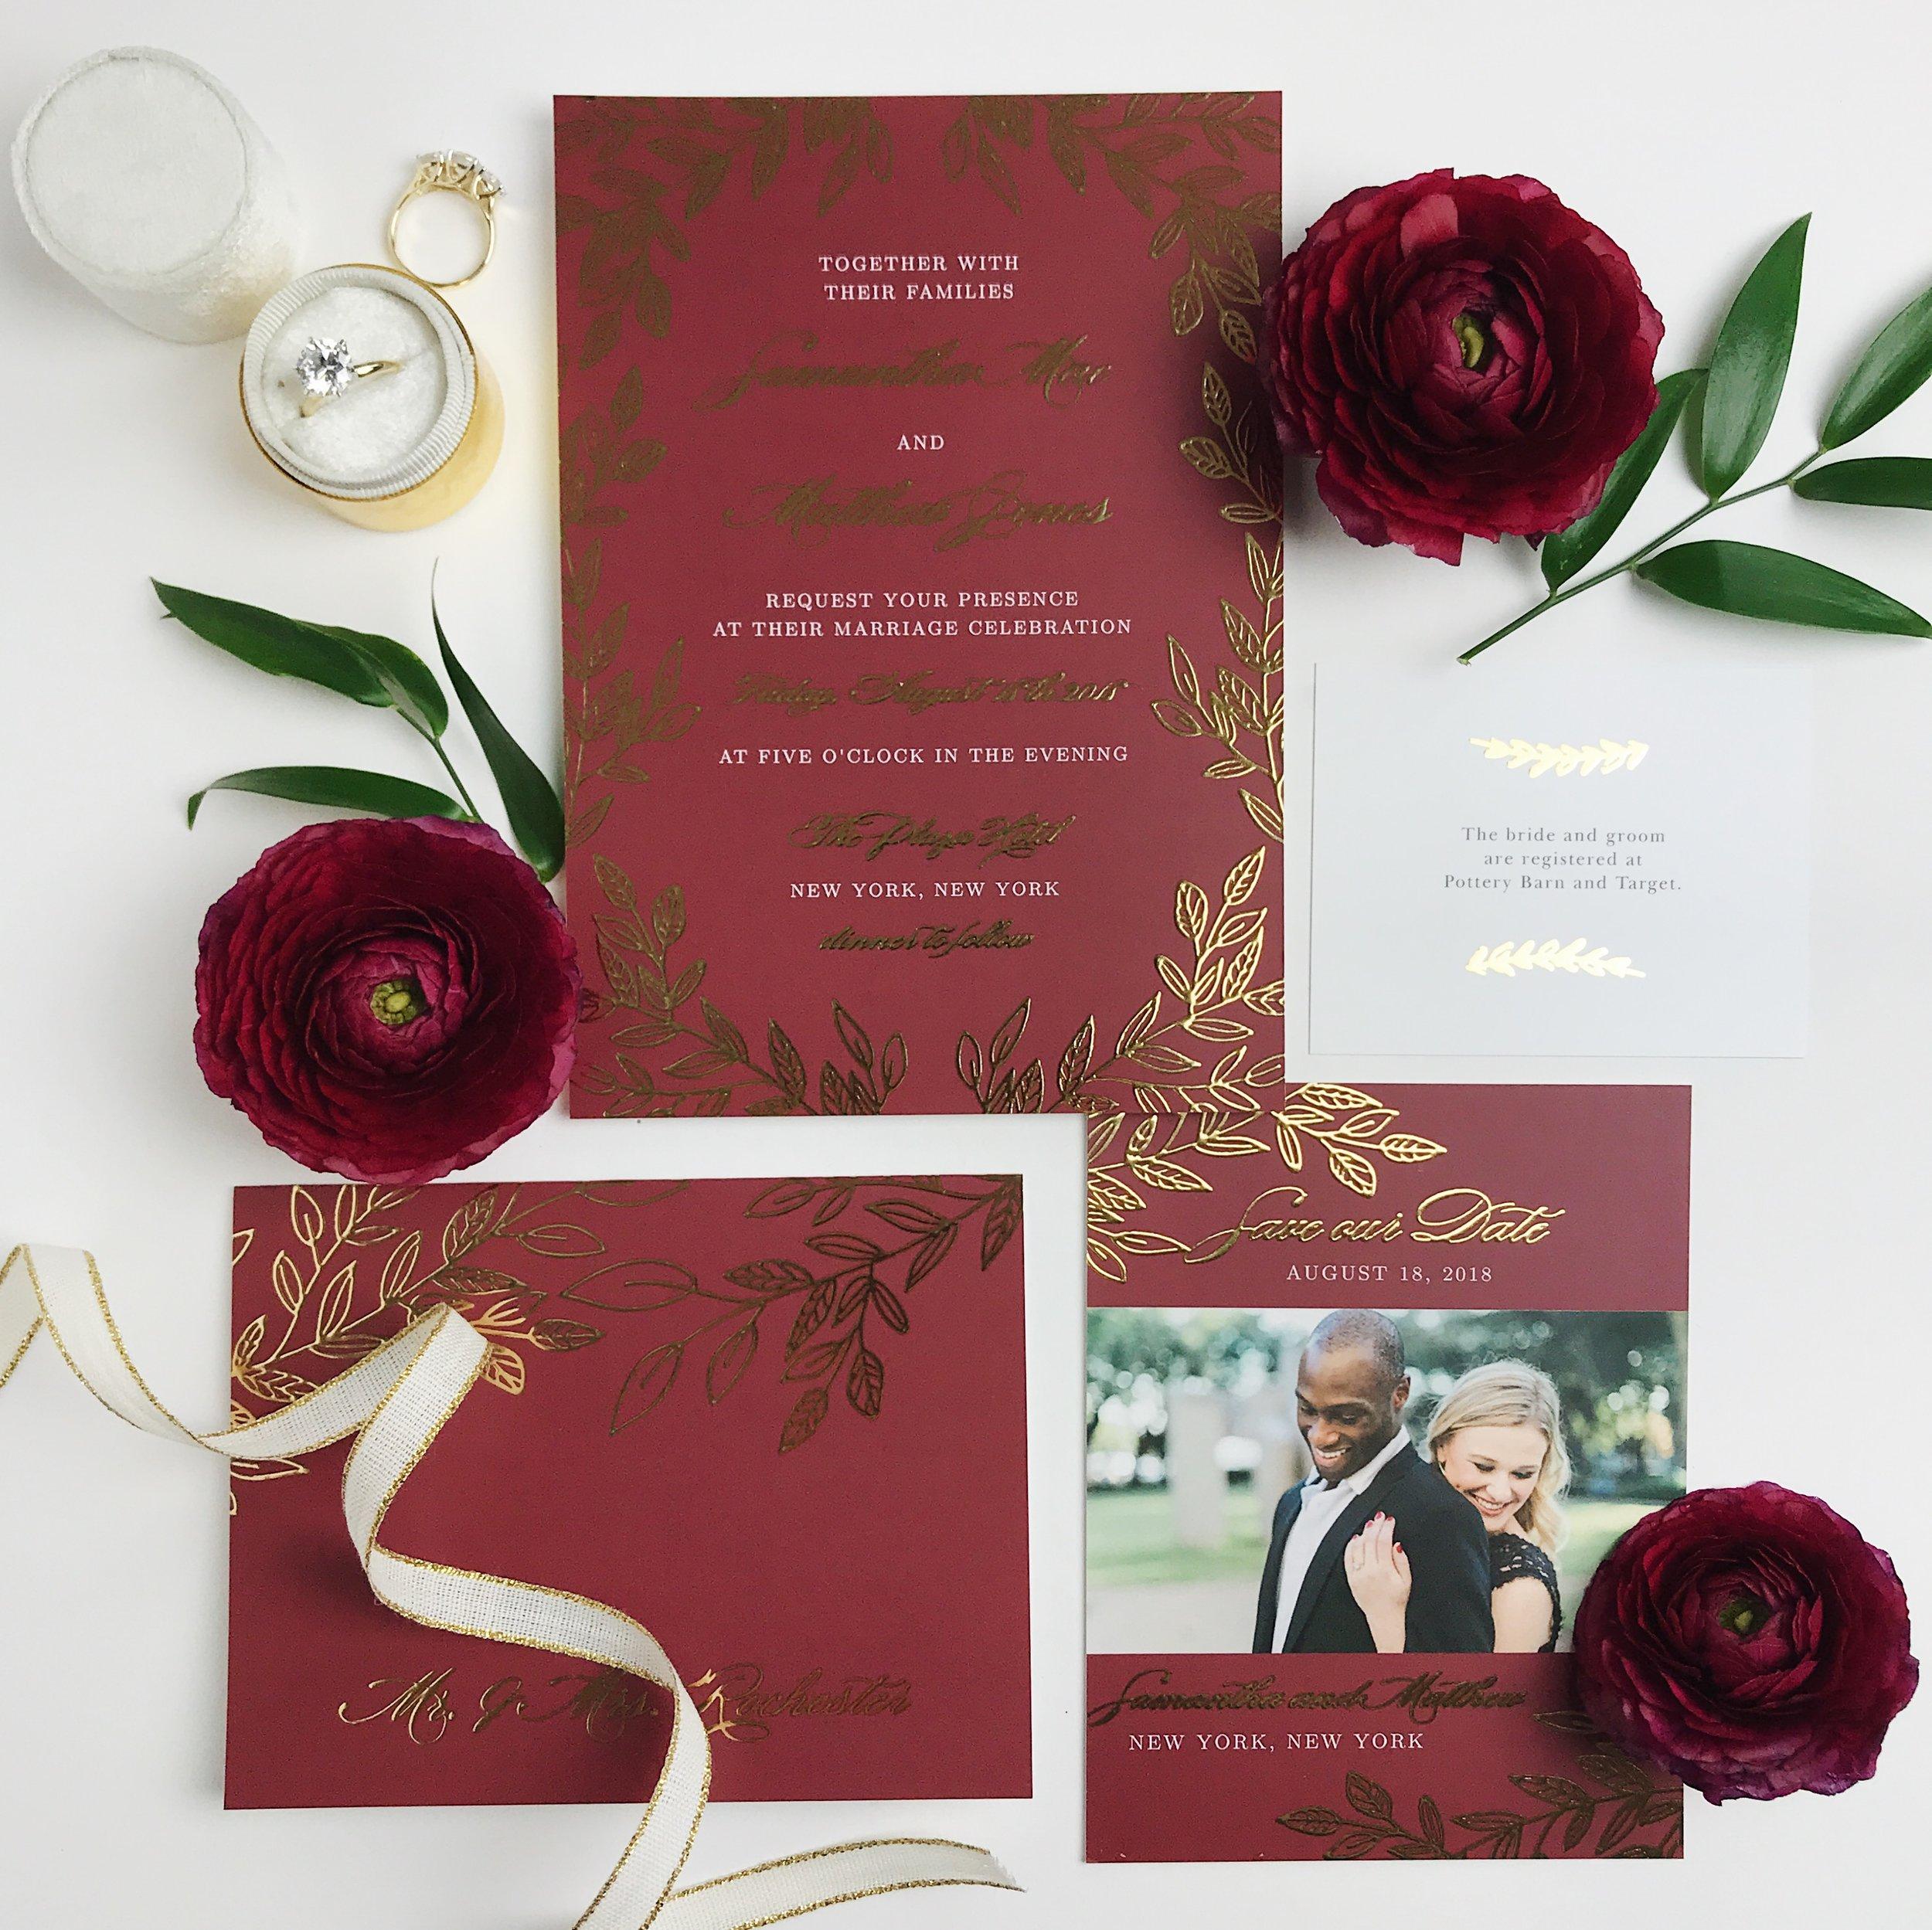 wedding photo save the dates